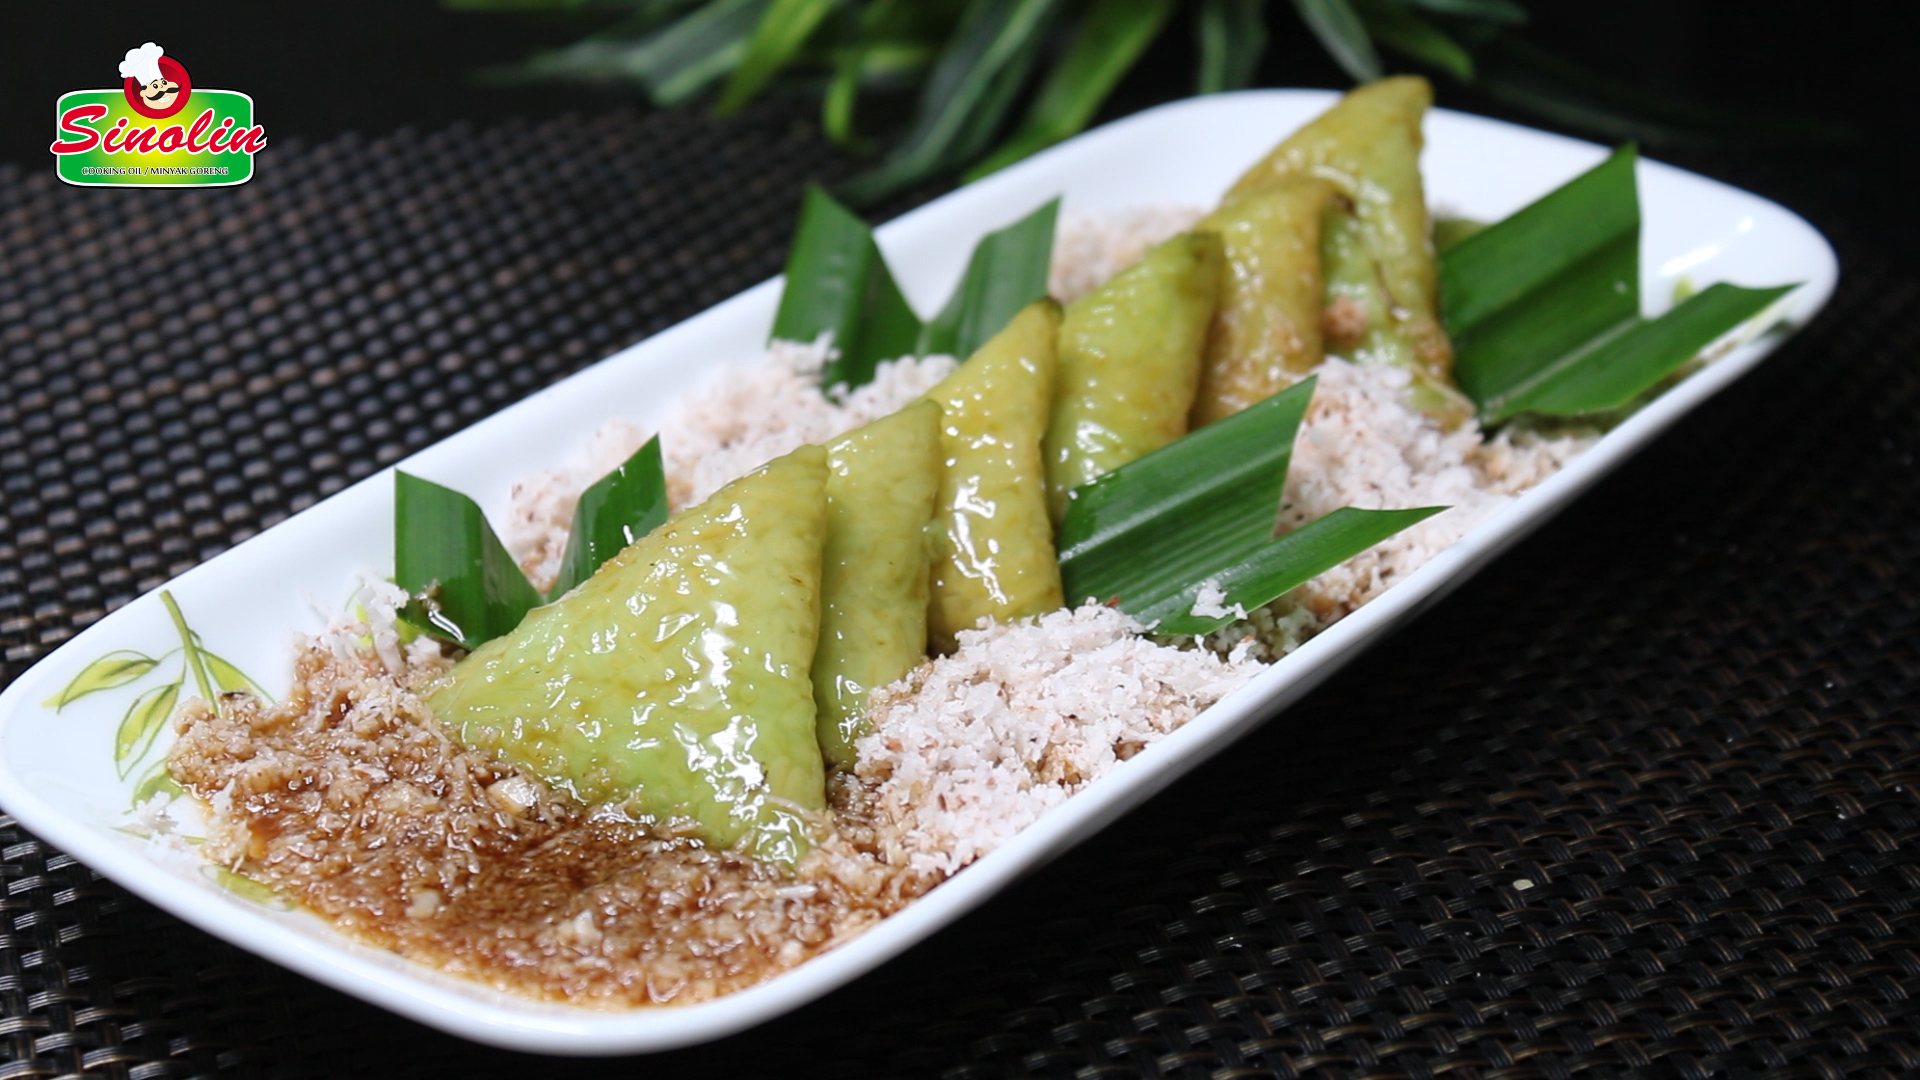 Lupis with Kincah Soup |Dapur Sinolin